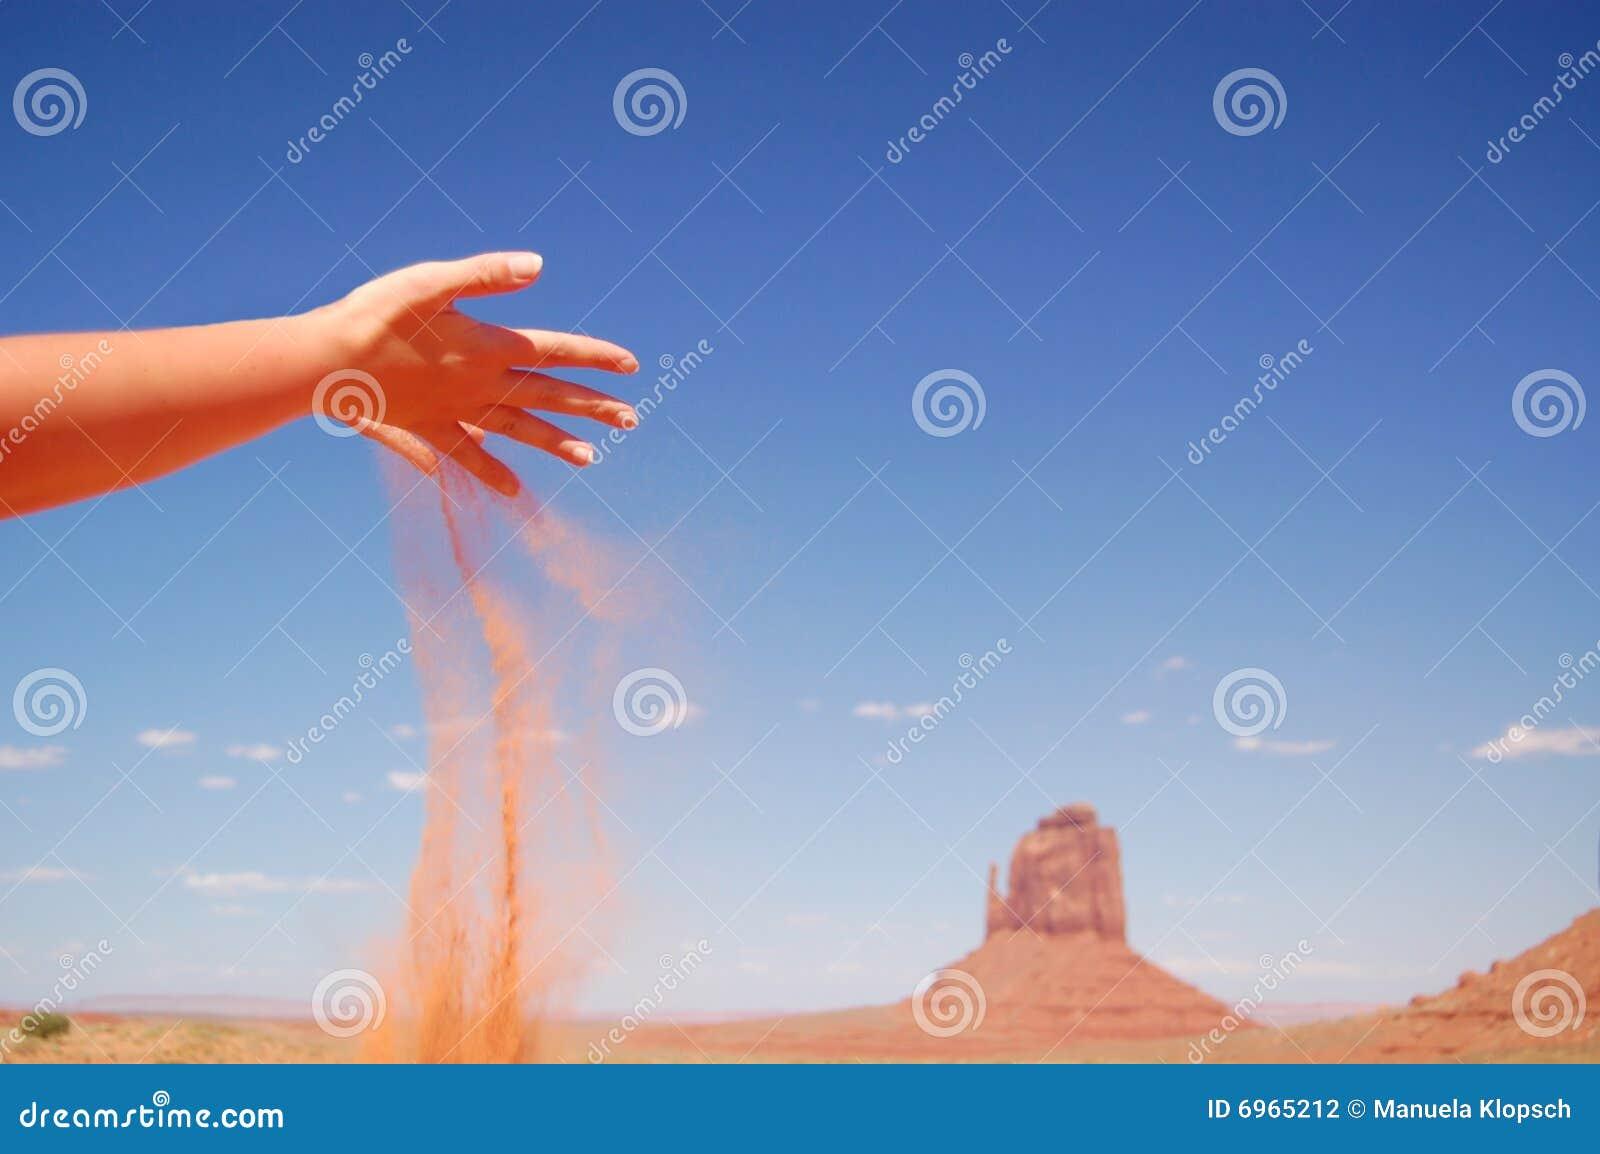 Falling Sand Stock Photography - Image: 6965212